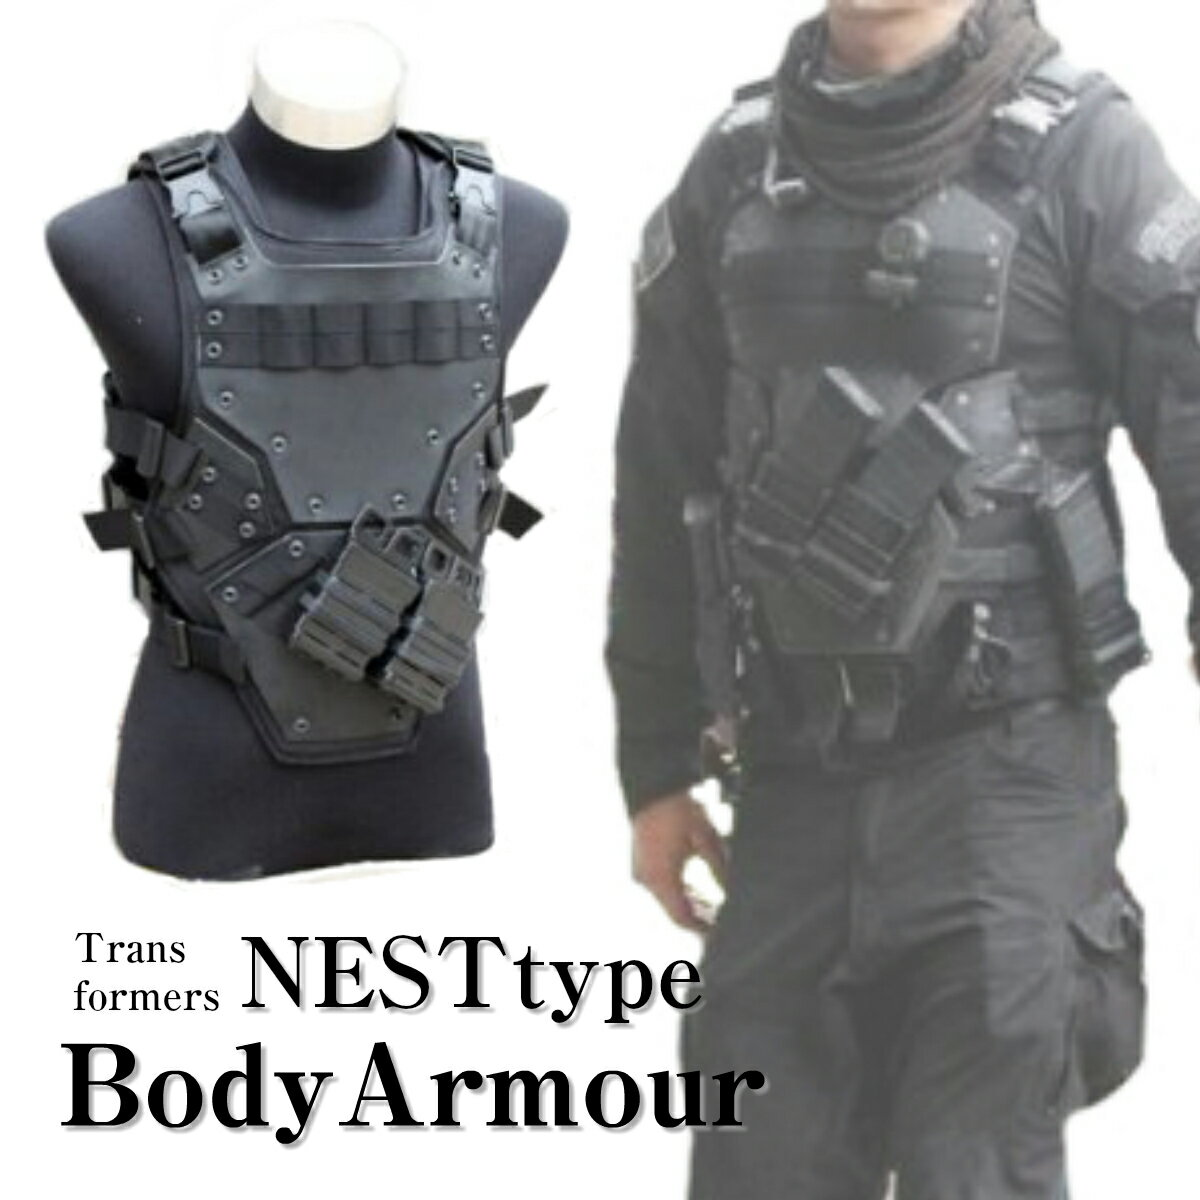 nest Transformers TF3 SWAT NEST